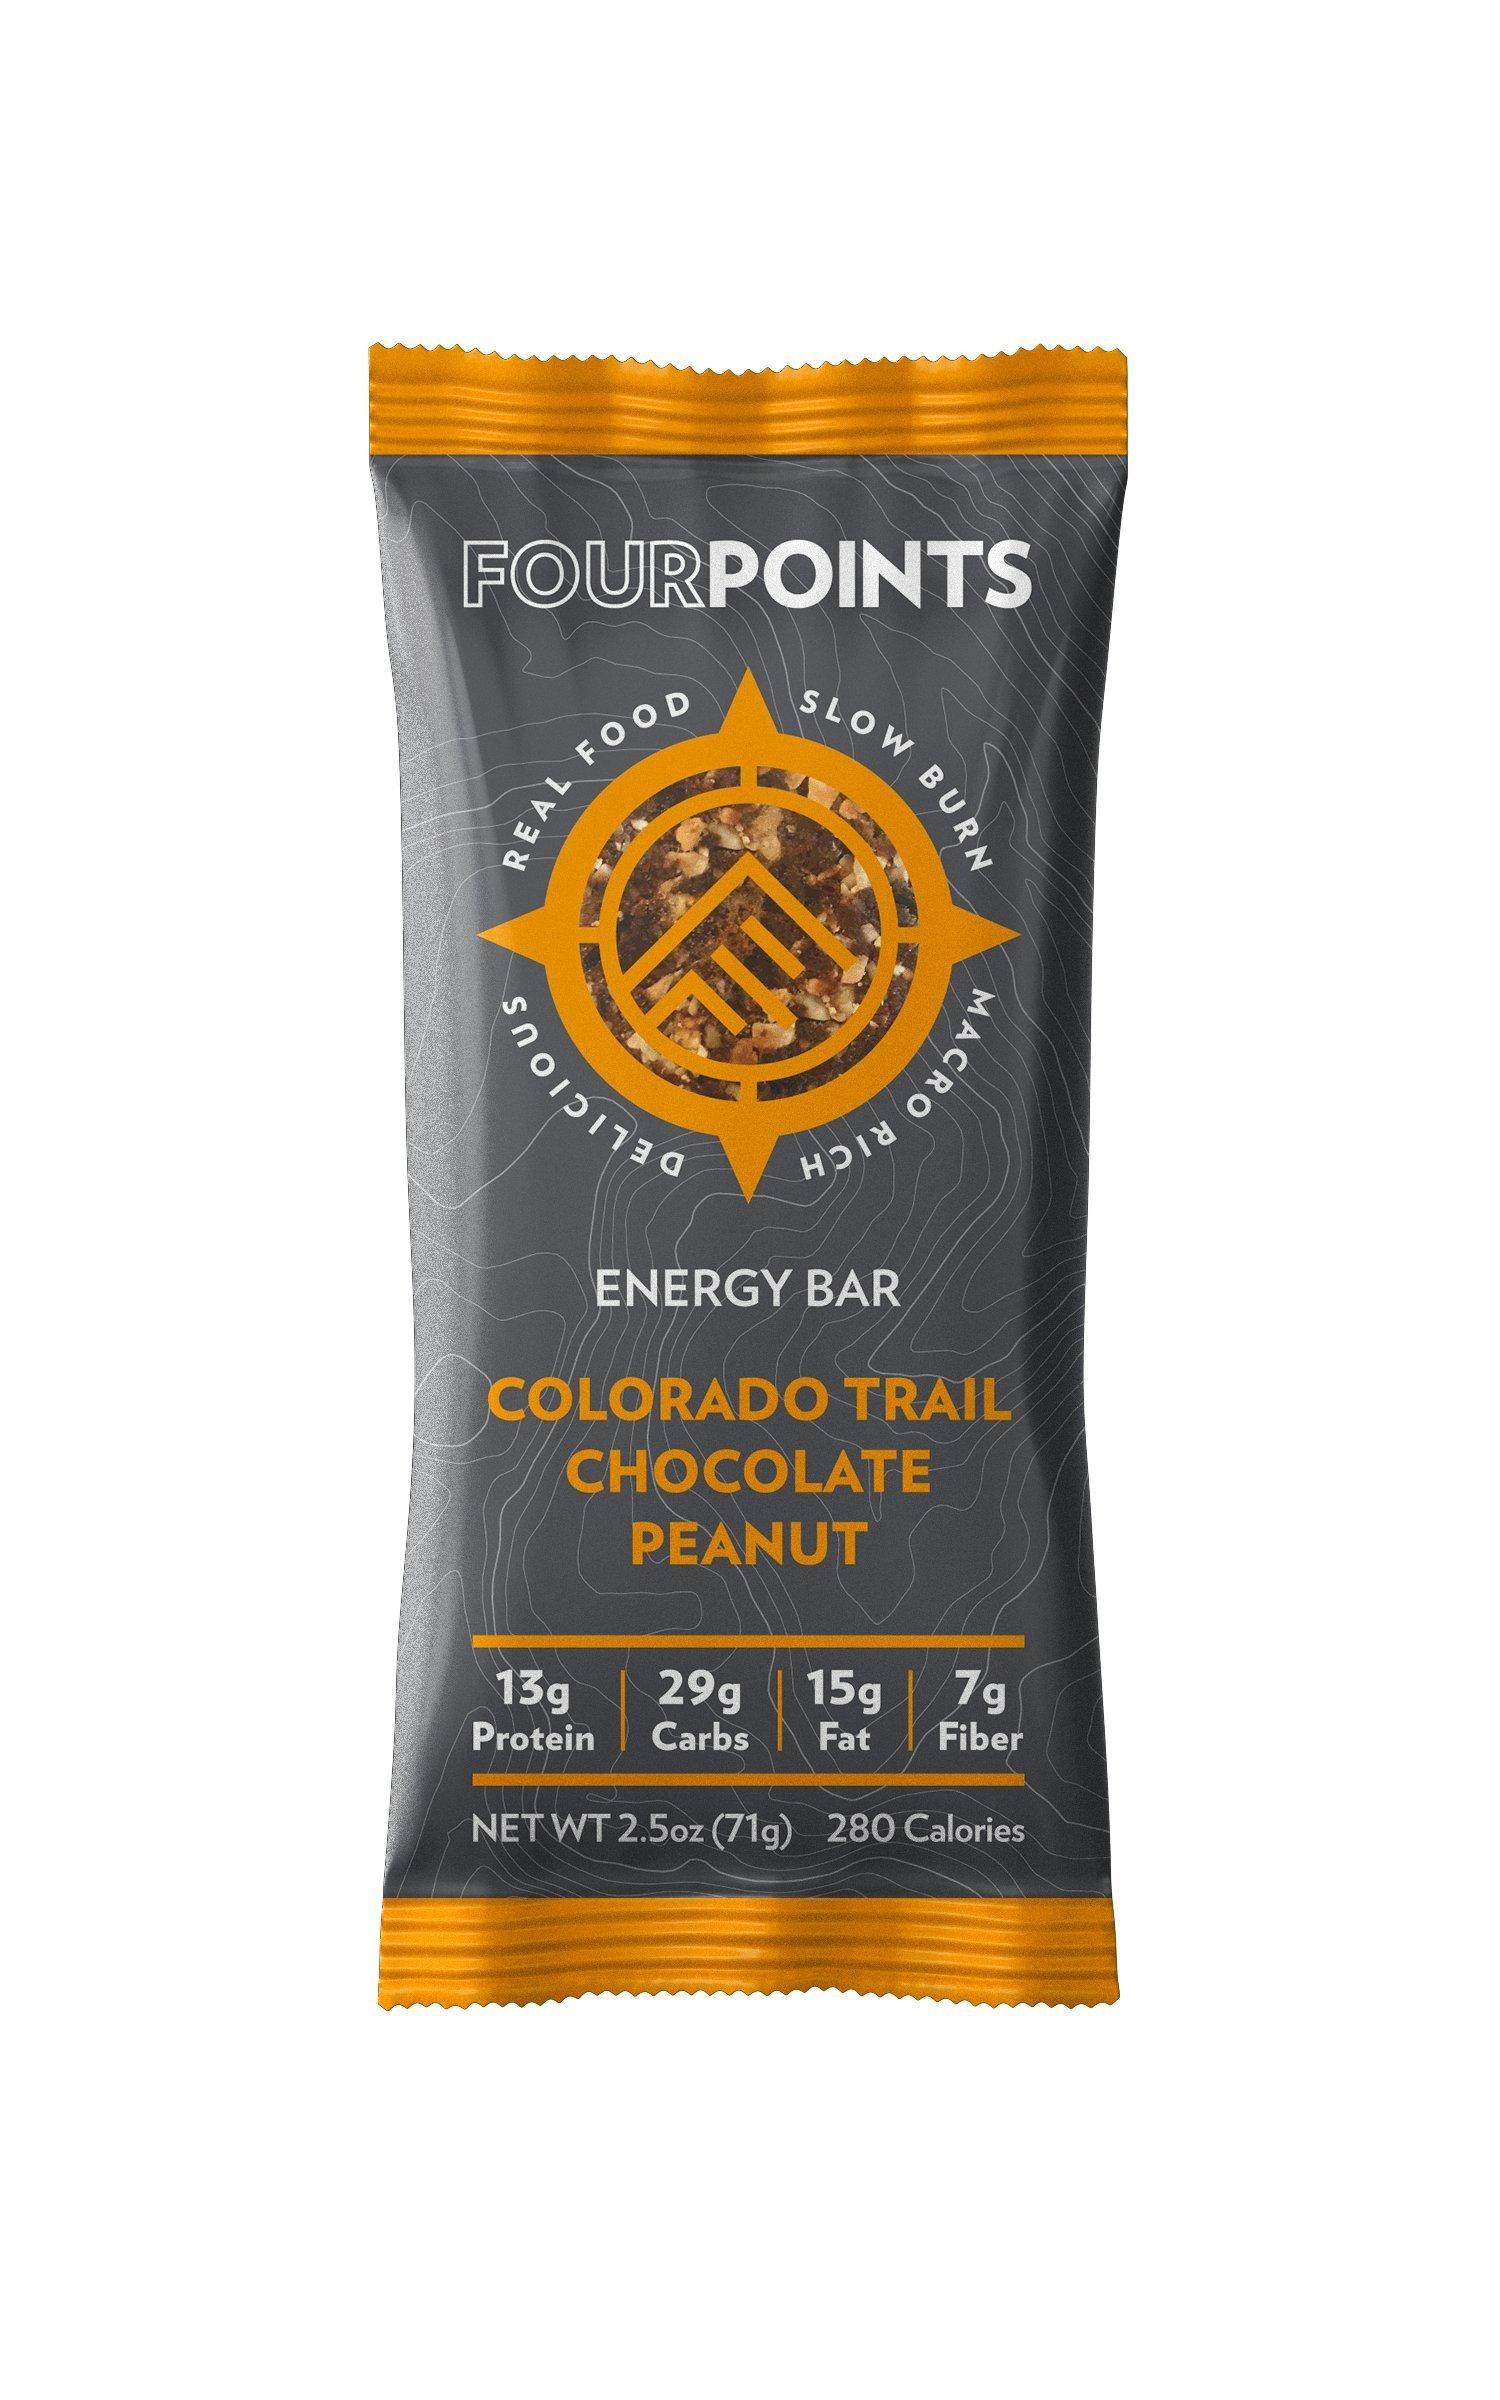 Fourpoints Colorado Trail Chocolate Peanut Bar - Box of 12 - Colorado Trail Chocolate Peanut, Box of 12 by Fourpoints Bar